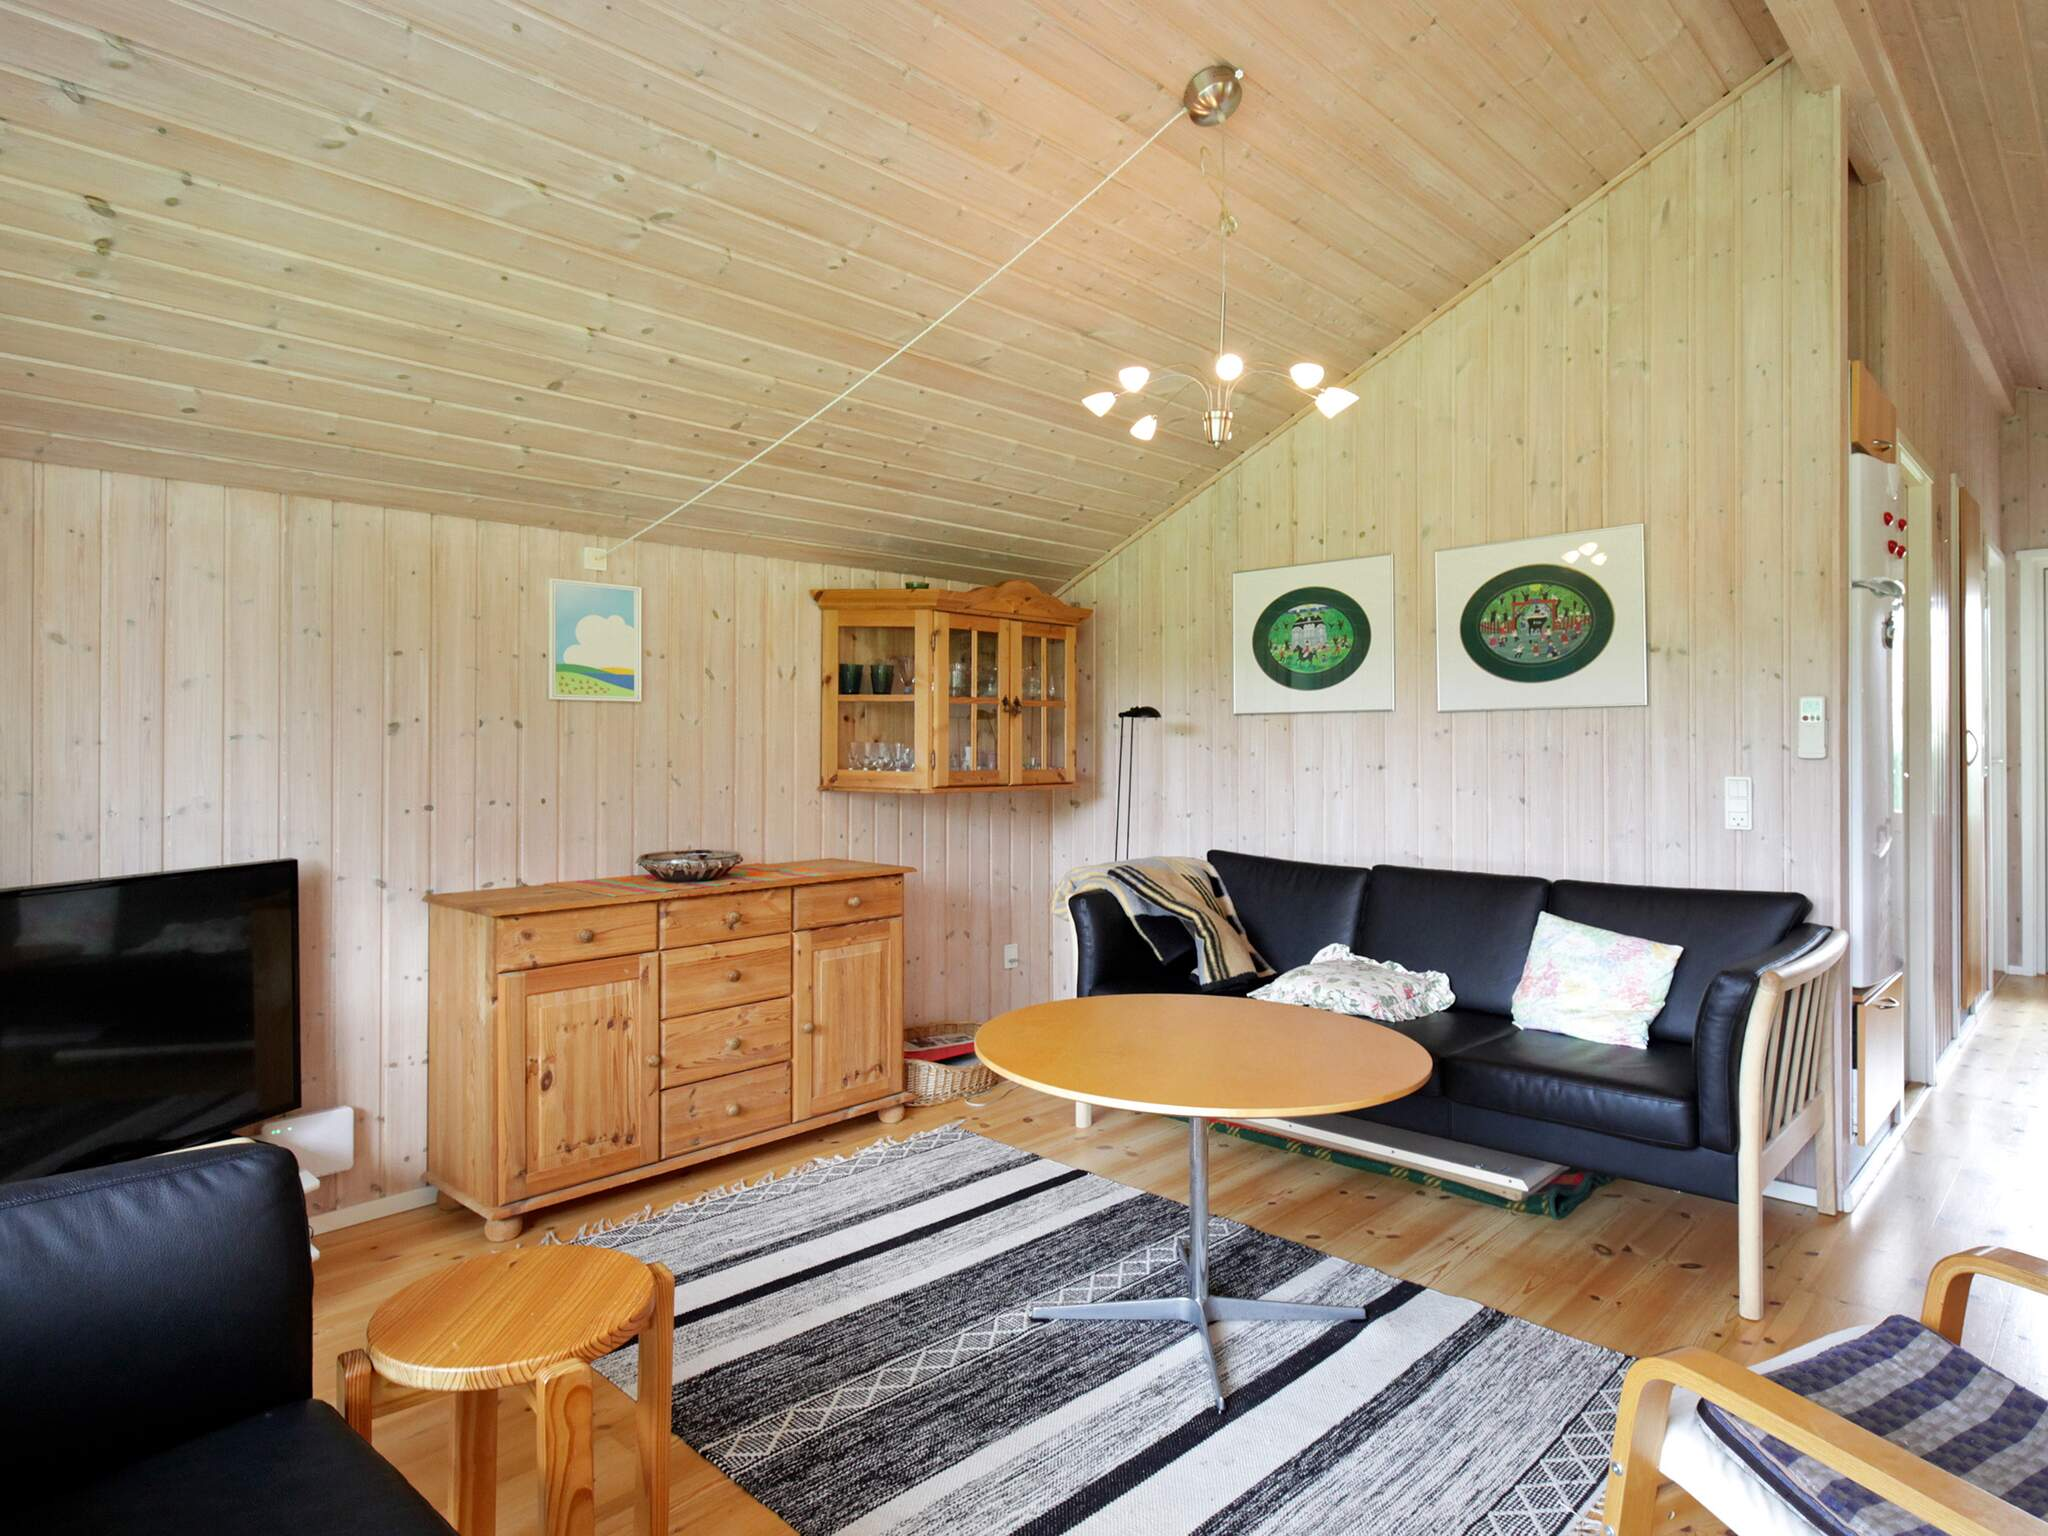 Ferienhaus Hyllingeriis (619896), Skibby, , Nordseeland, Dänemark, Bild 9